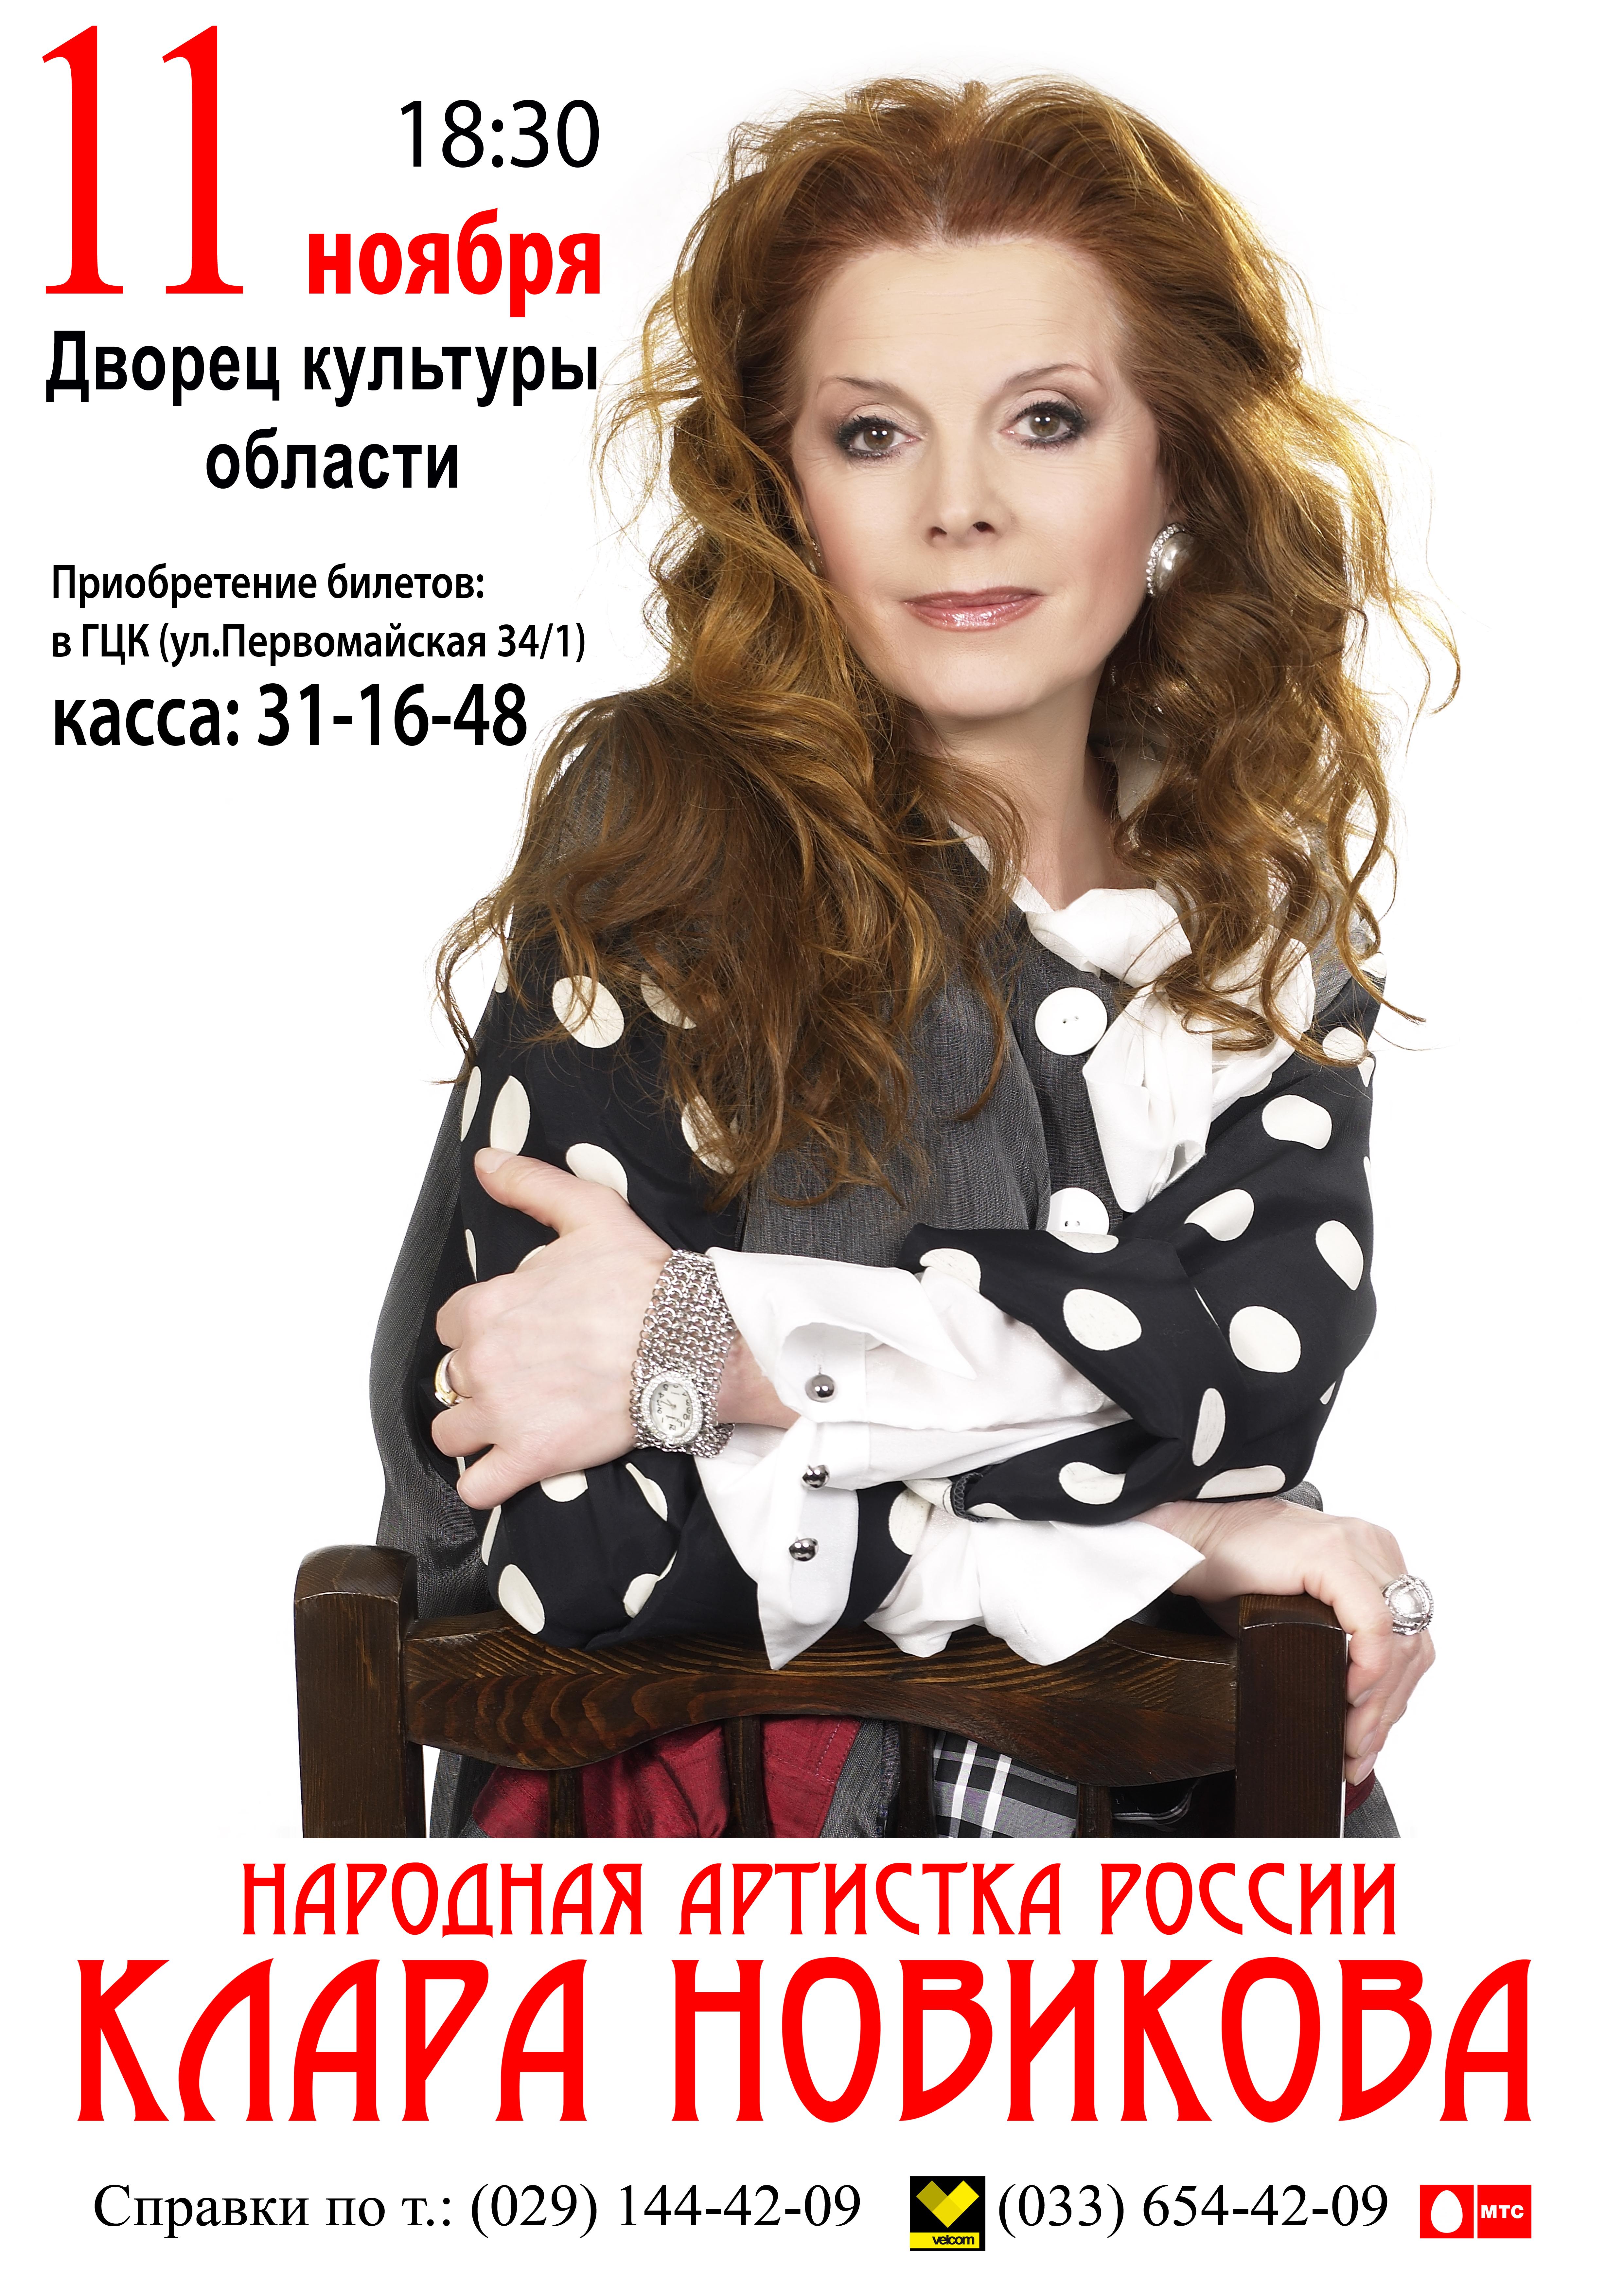 Клара новикова личная жизнь дети фото